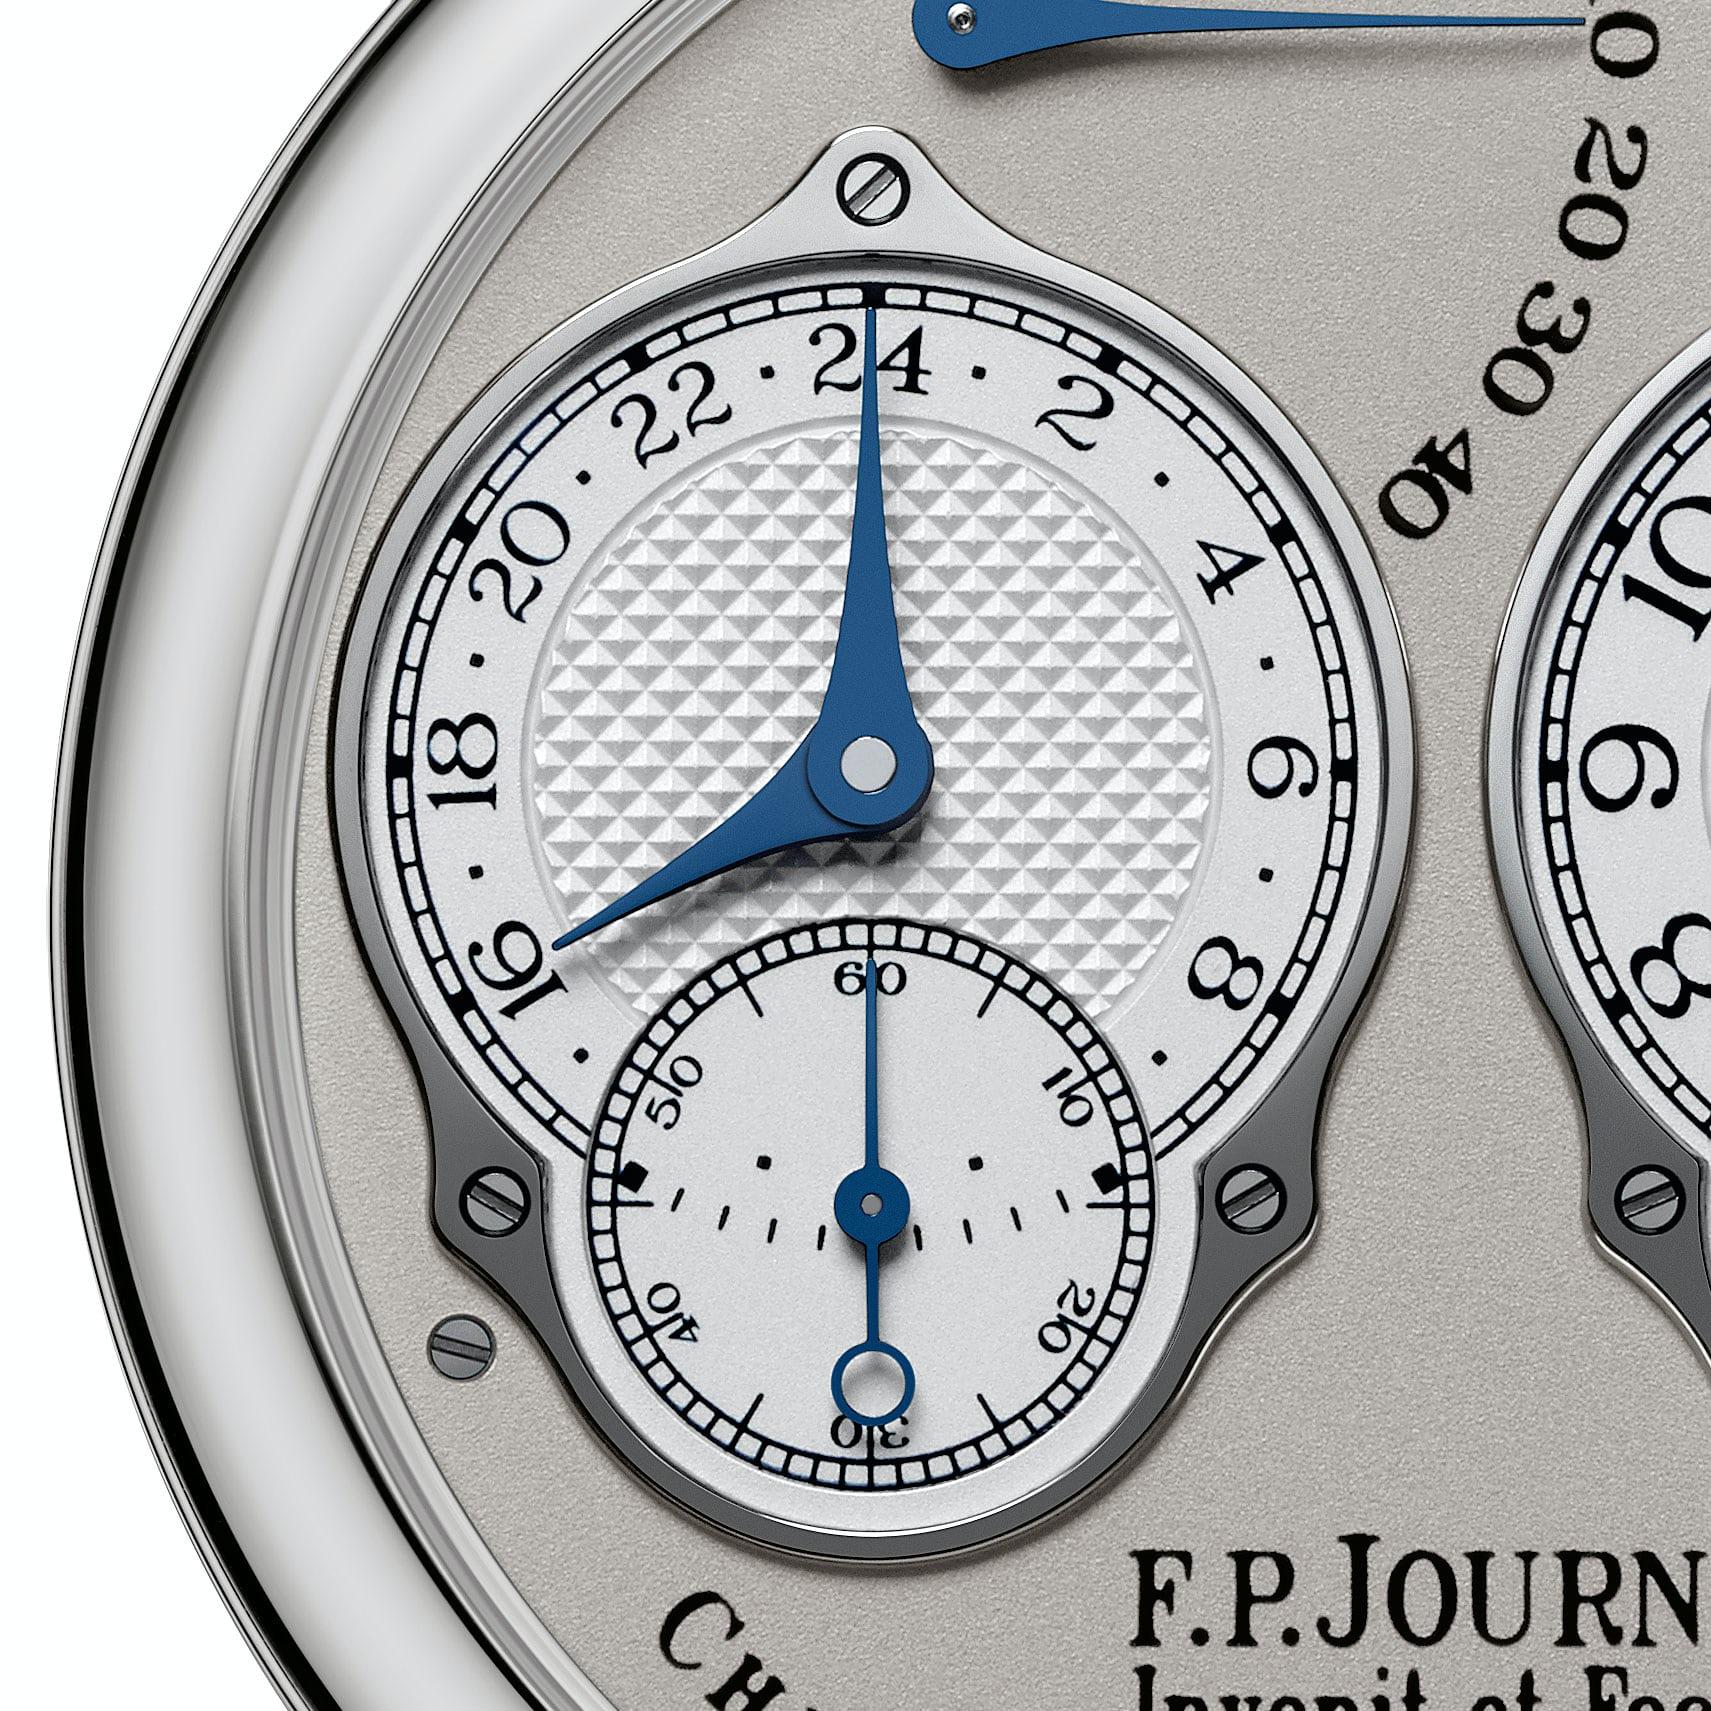 fp-journe-chronometre-a-resonance-24hours-display